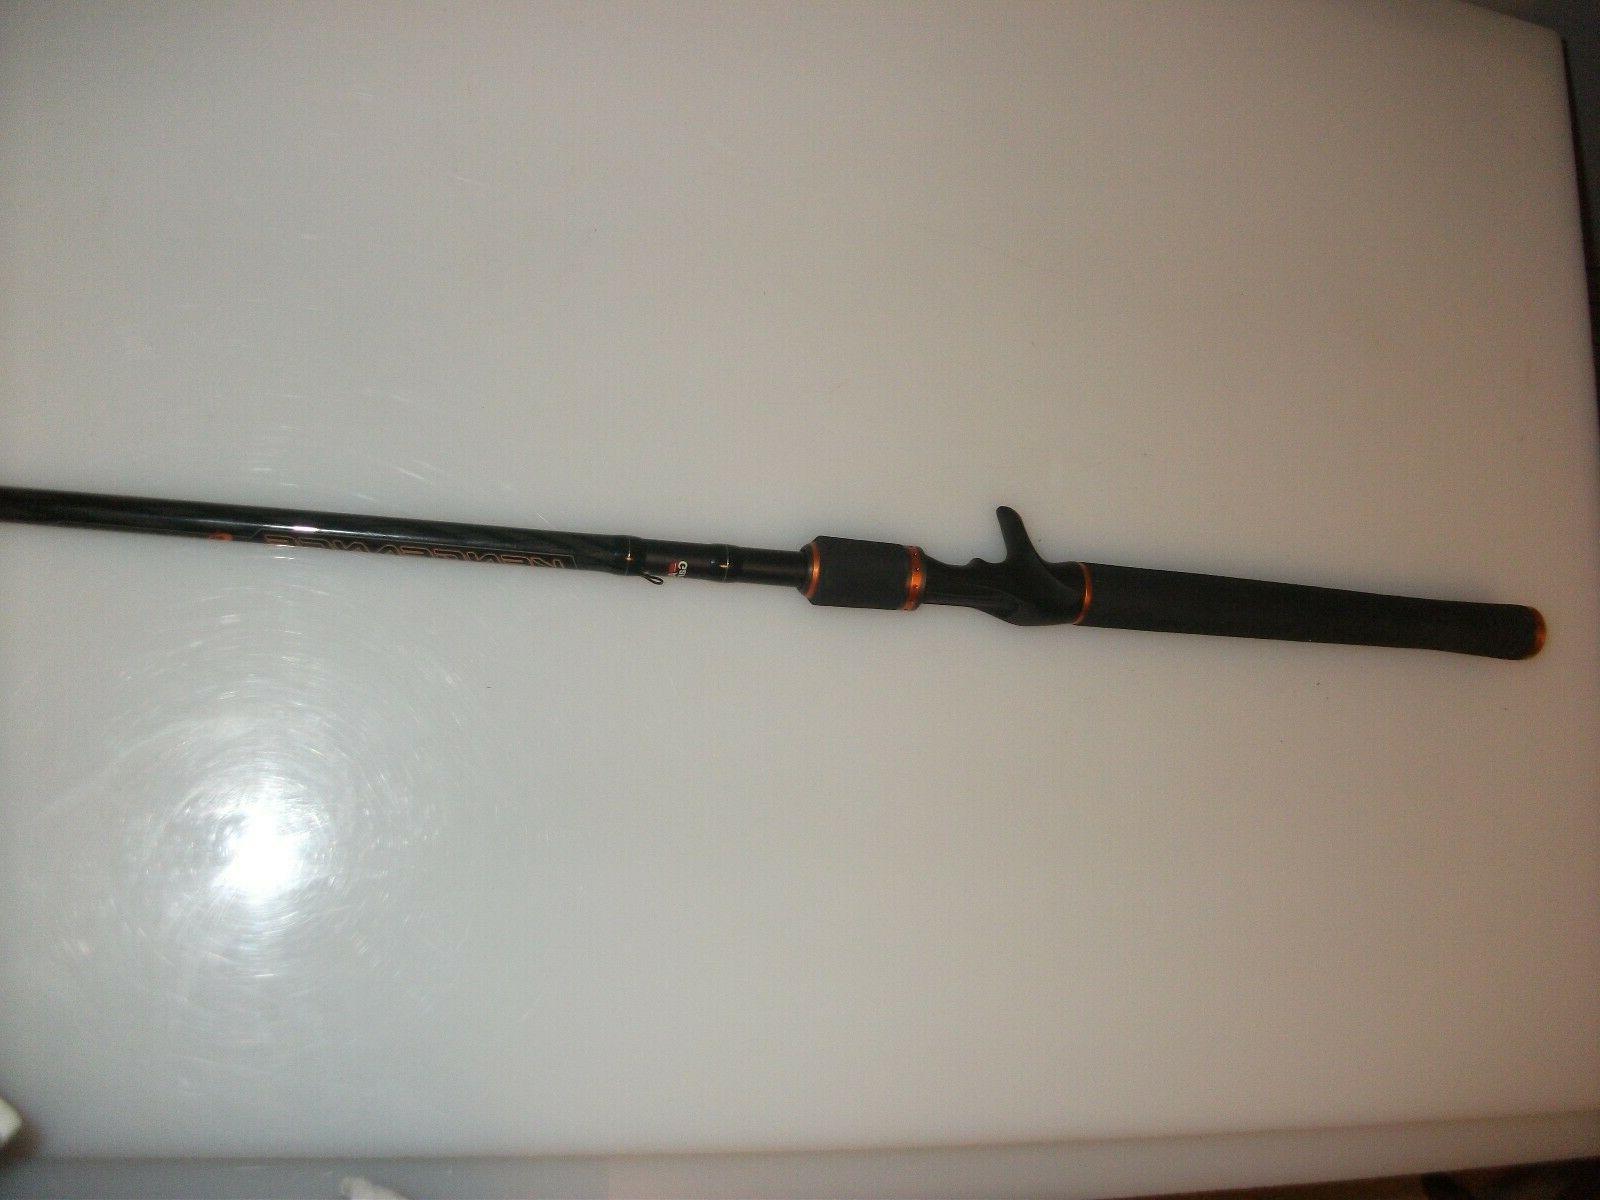 1990s vengeance spinning rod 7 6 heavy